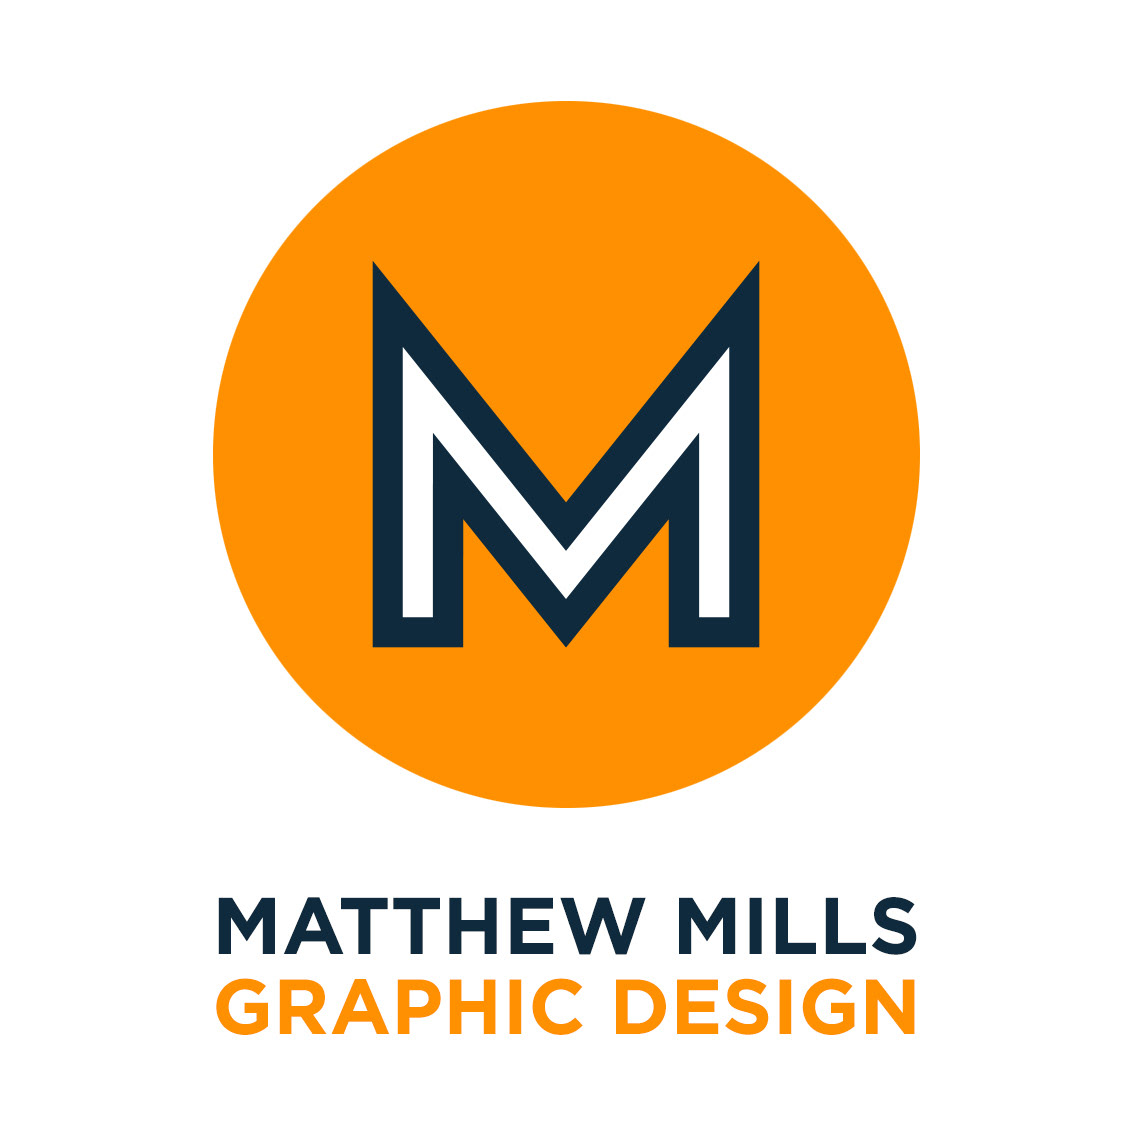 Matthew Mills